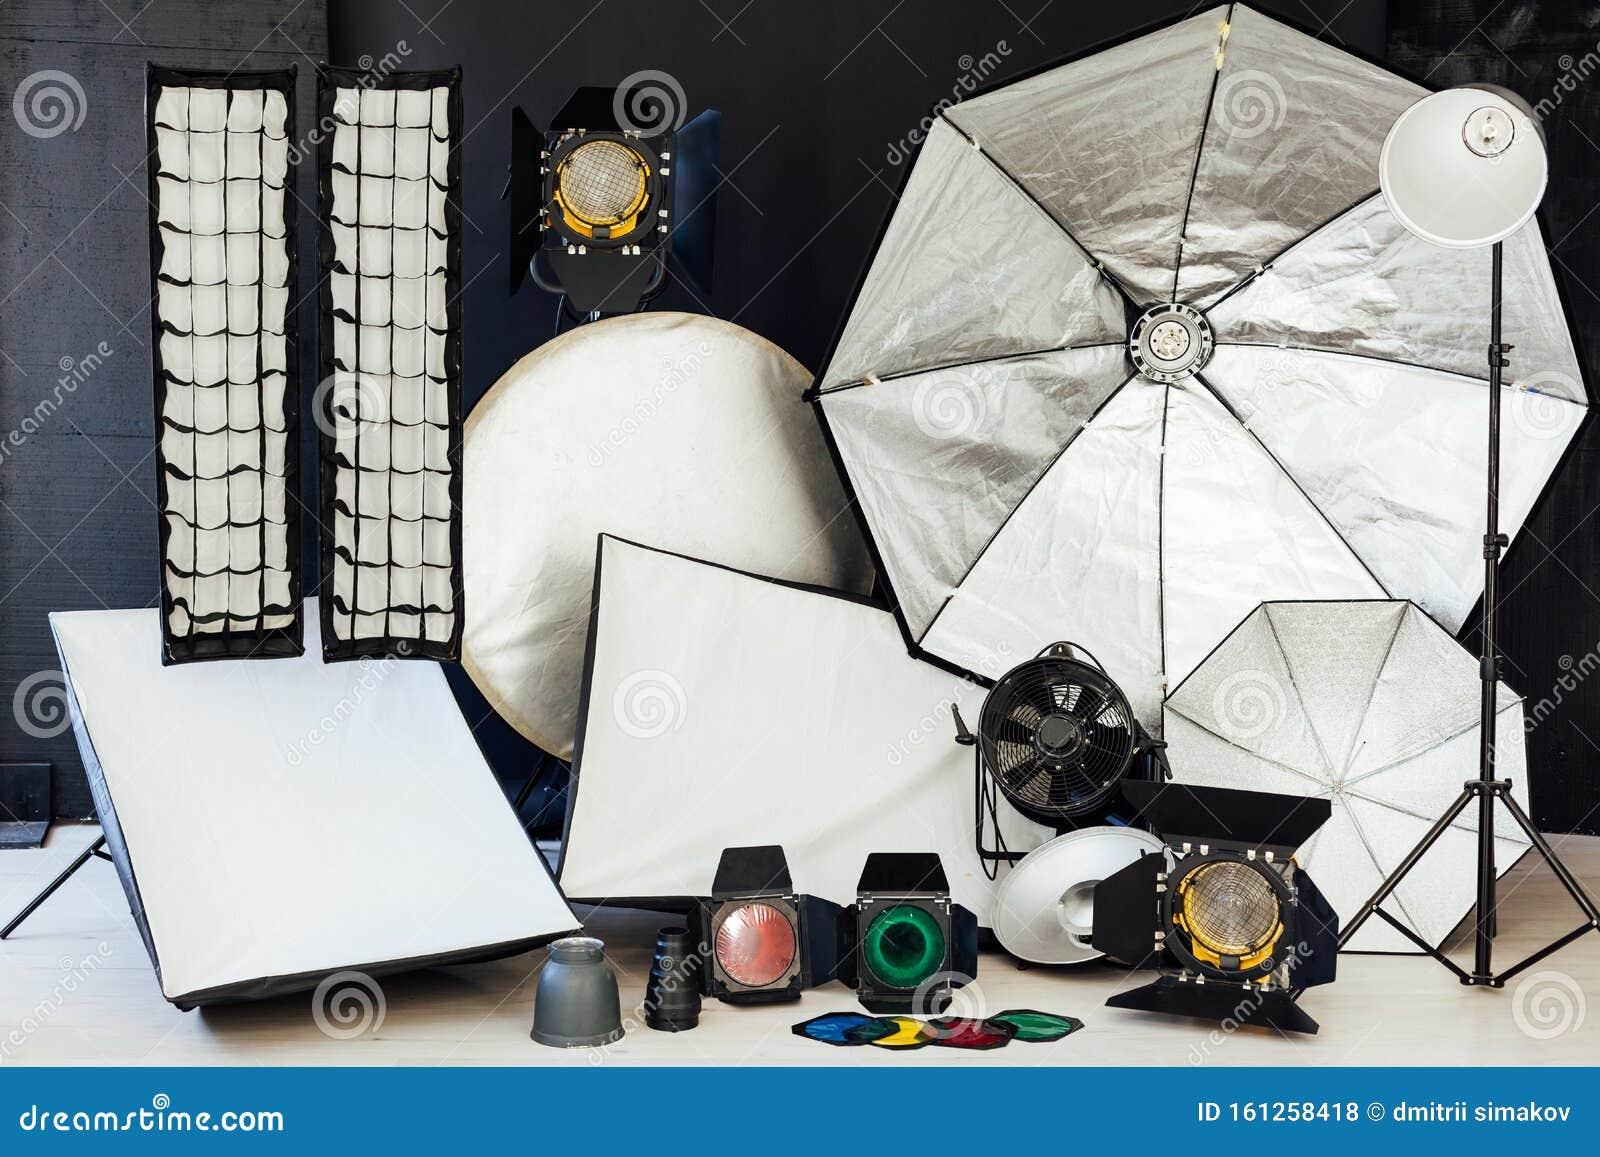 Photo Studio Accessories Photographer S Interior White Background Stock Photo Image Of Diffuser Business 161258418